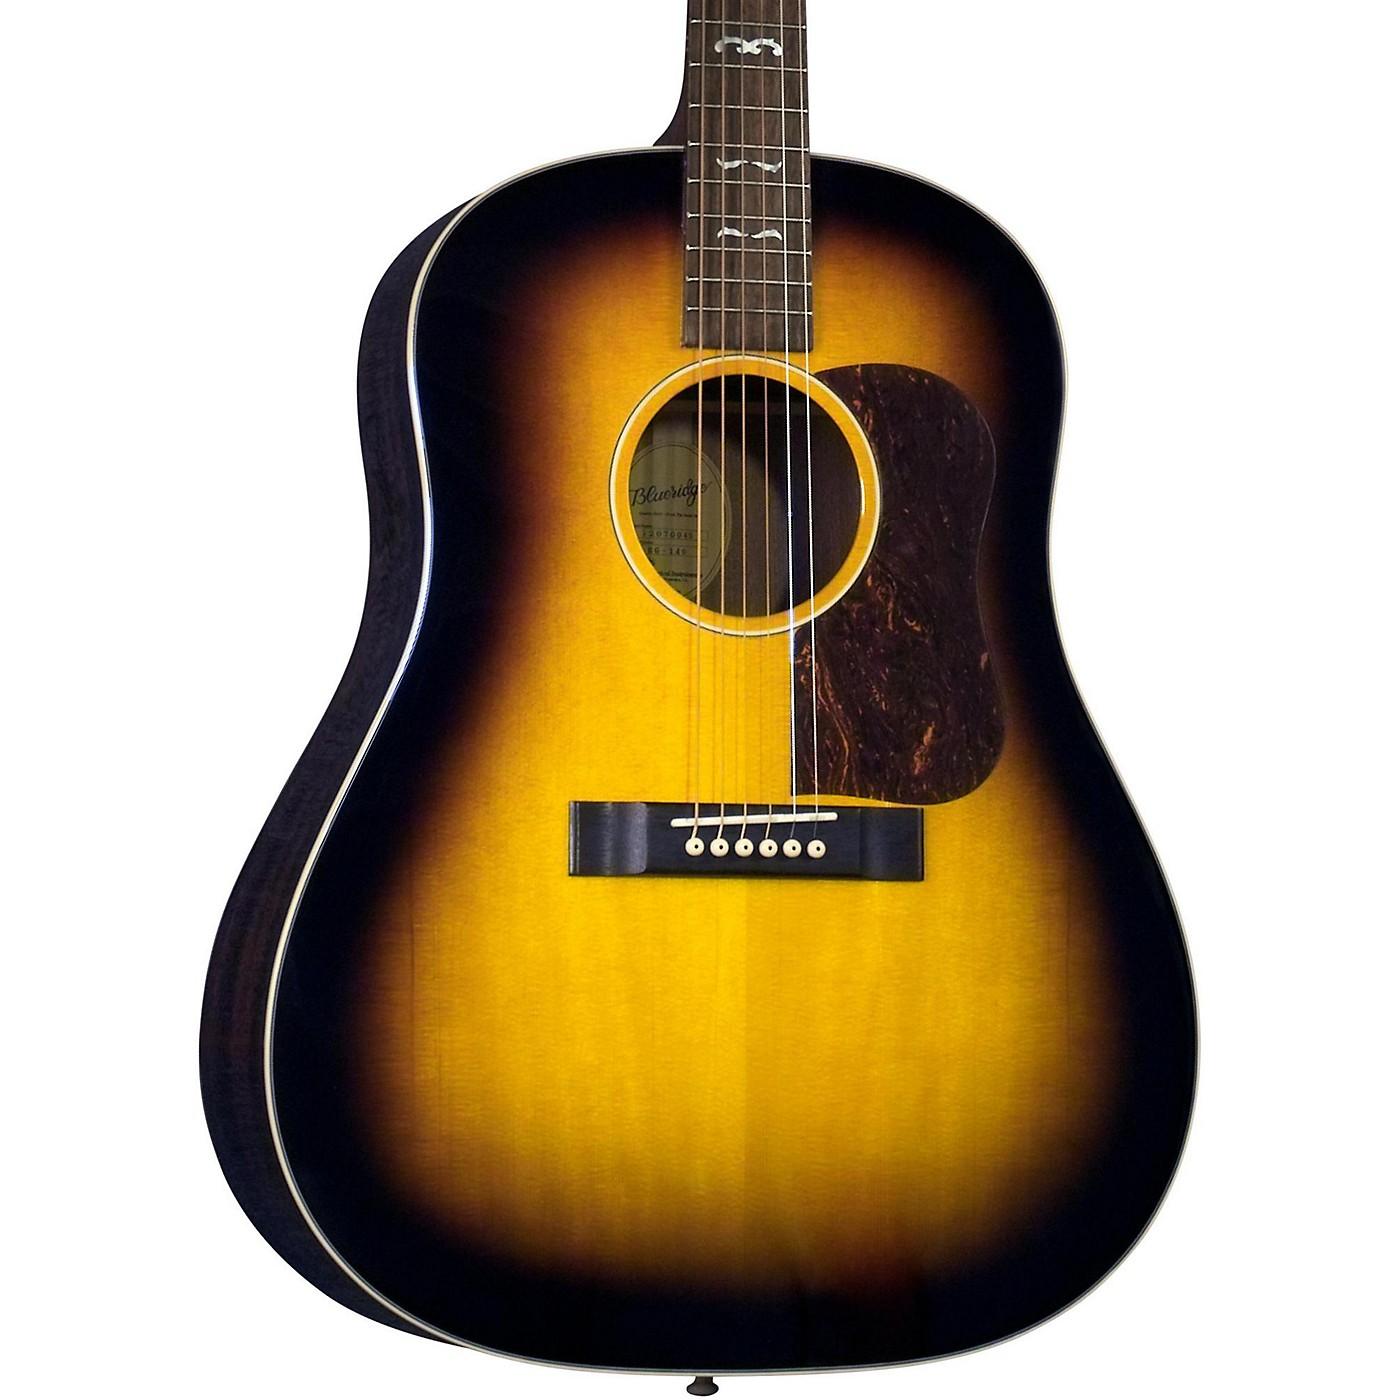 Blueridge Historic Series BG-140 Slope-Shoulder Dreadnought Acoustic Guitar thumbnail